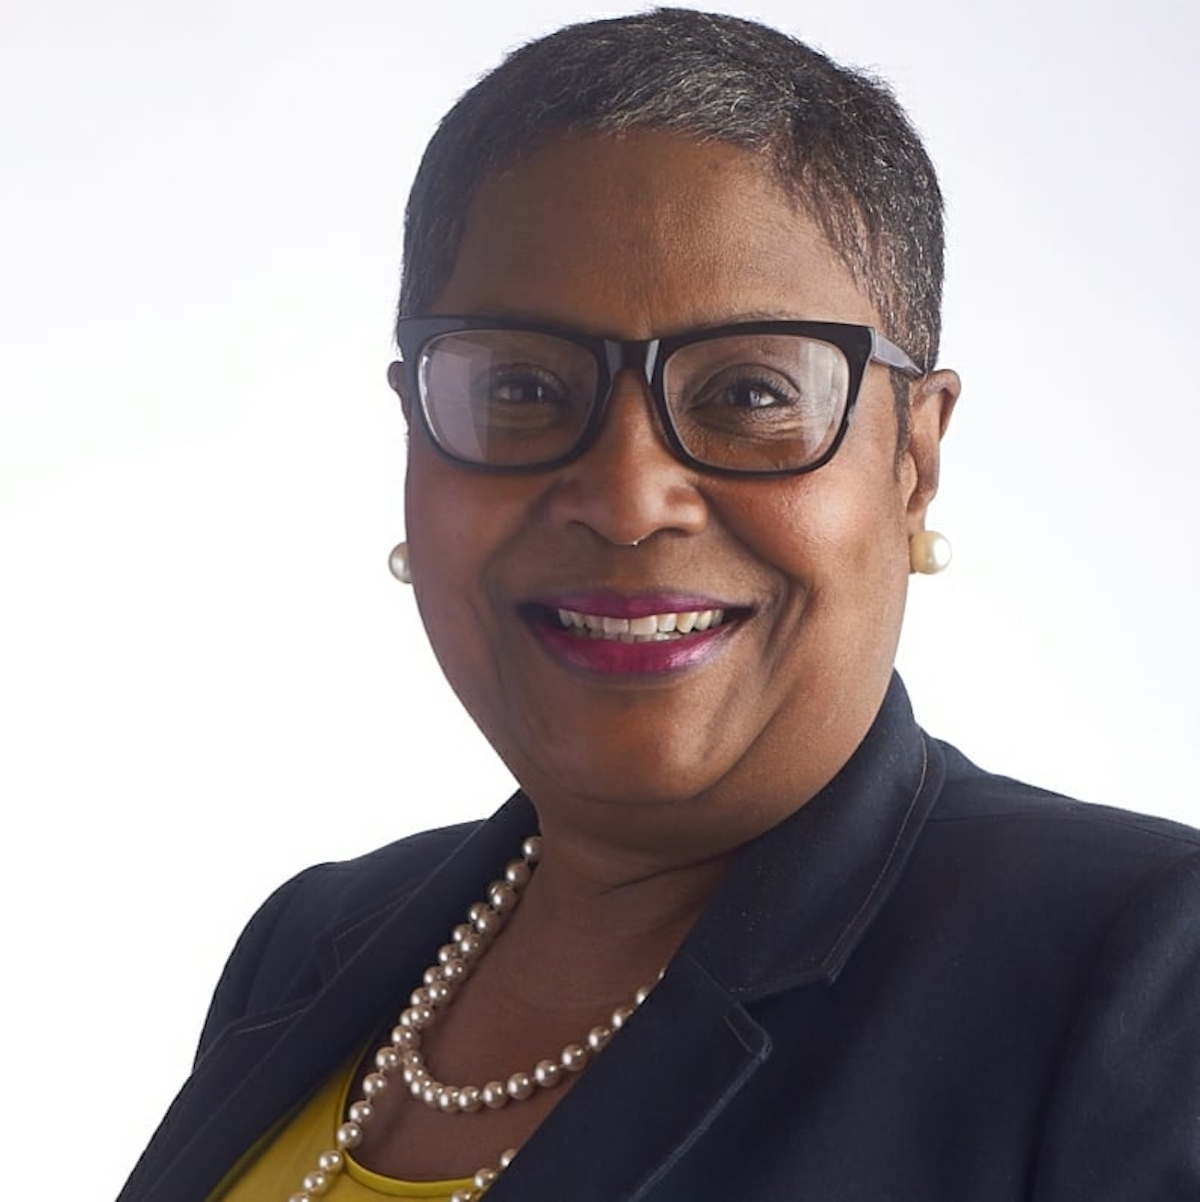 Debra Davis, Willoughby Avenue, The Five Fifths, KOLUMN Magazine, KOLUMN, African American Politics, Black in Politics